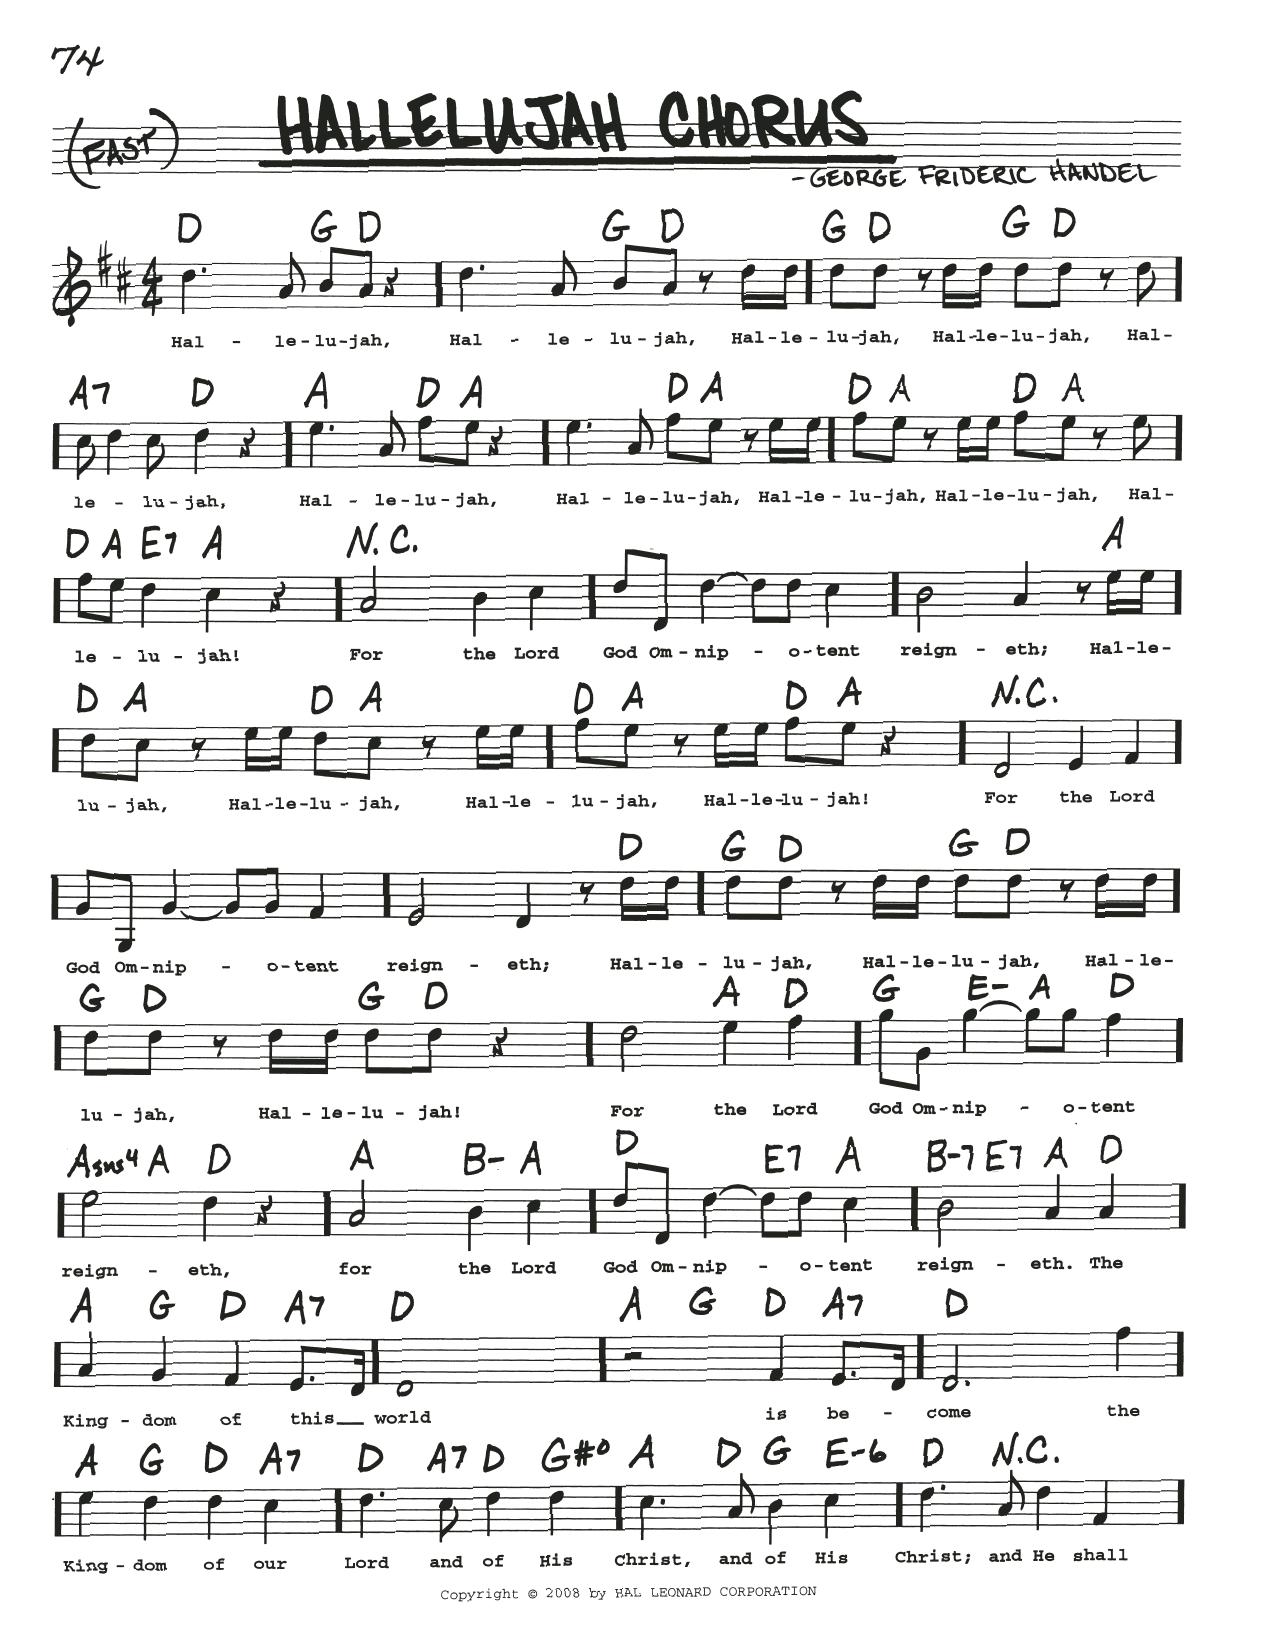 Hallelujah Chorus Sheet Music